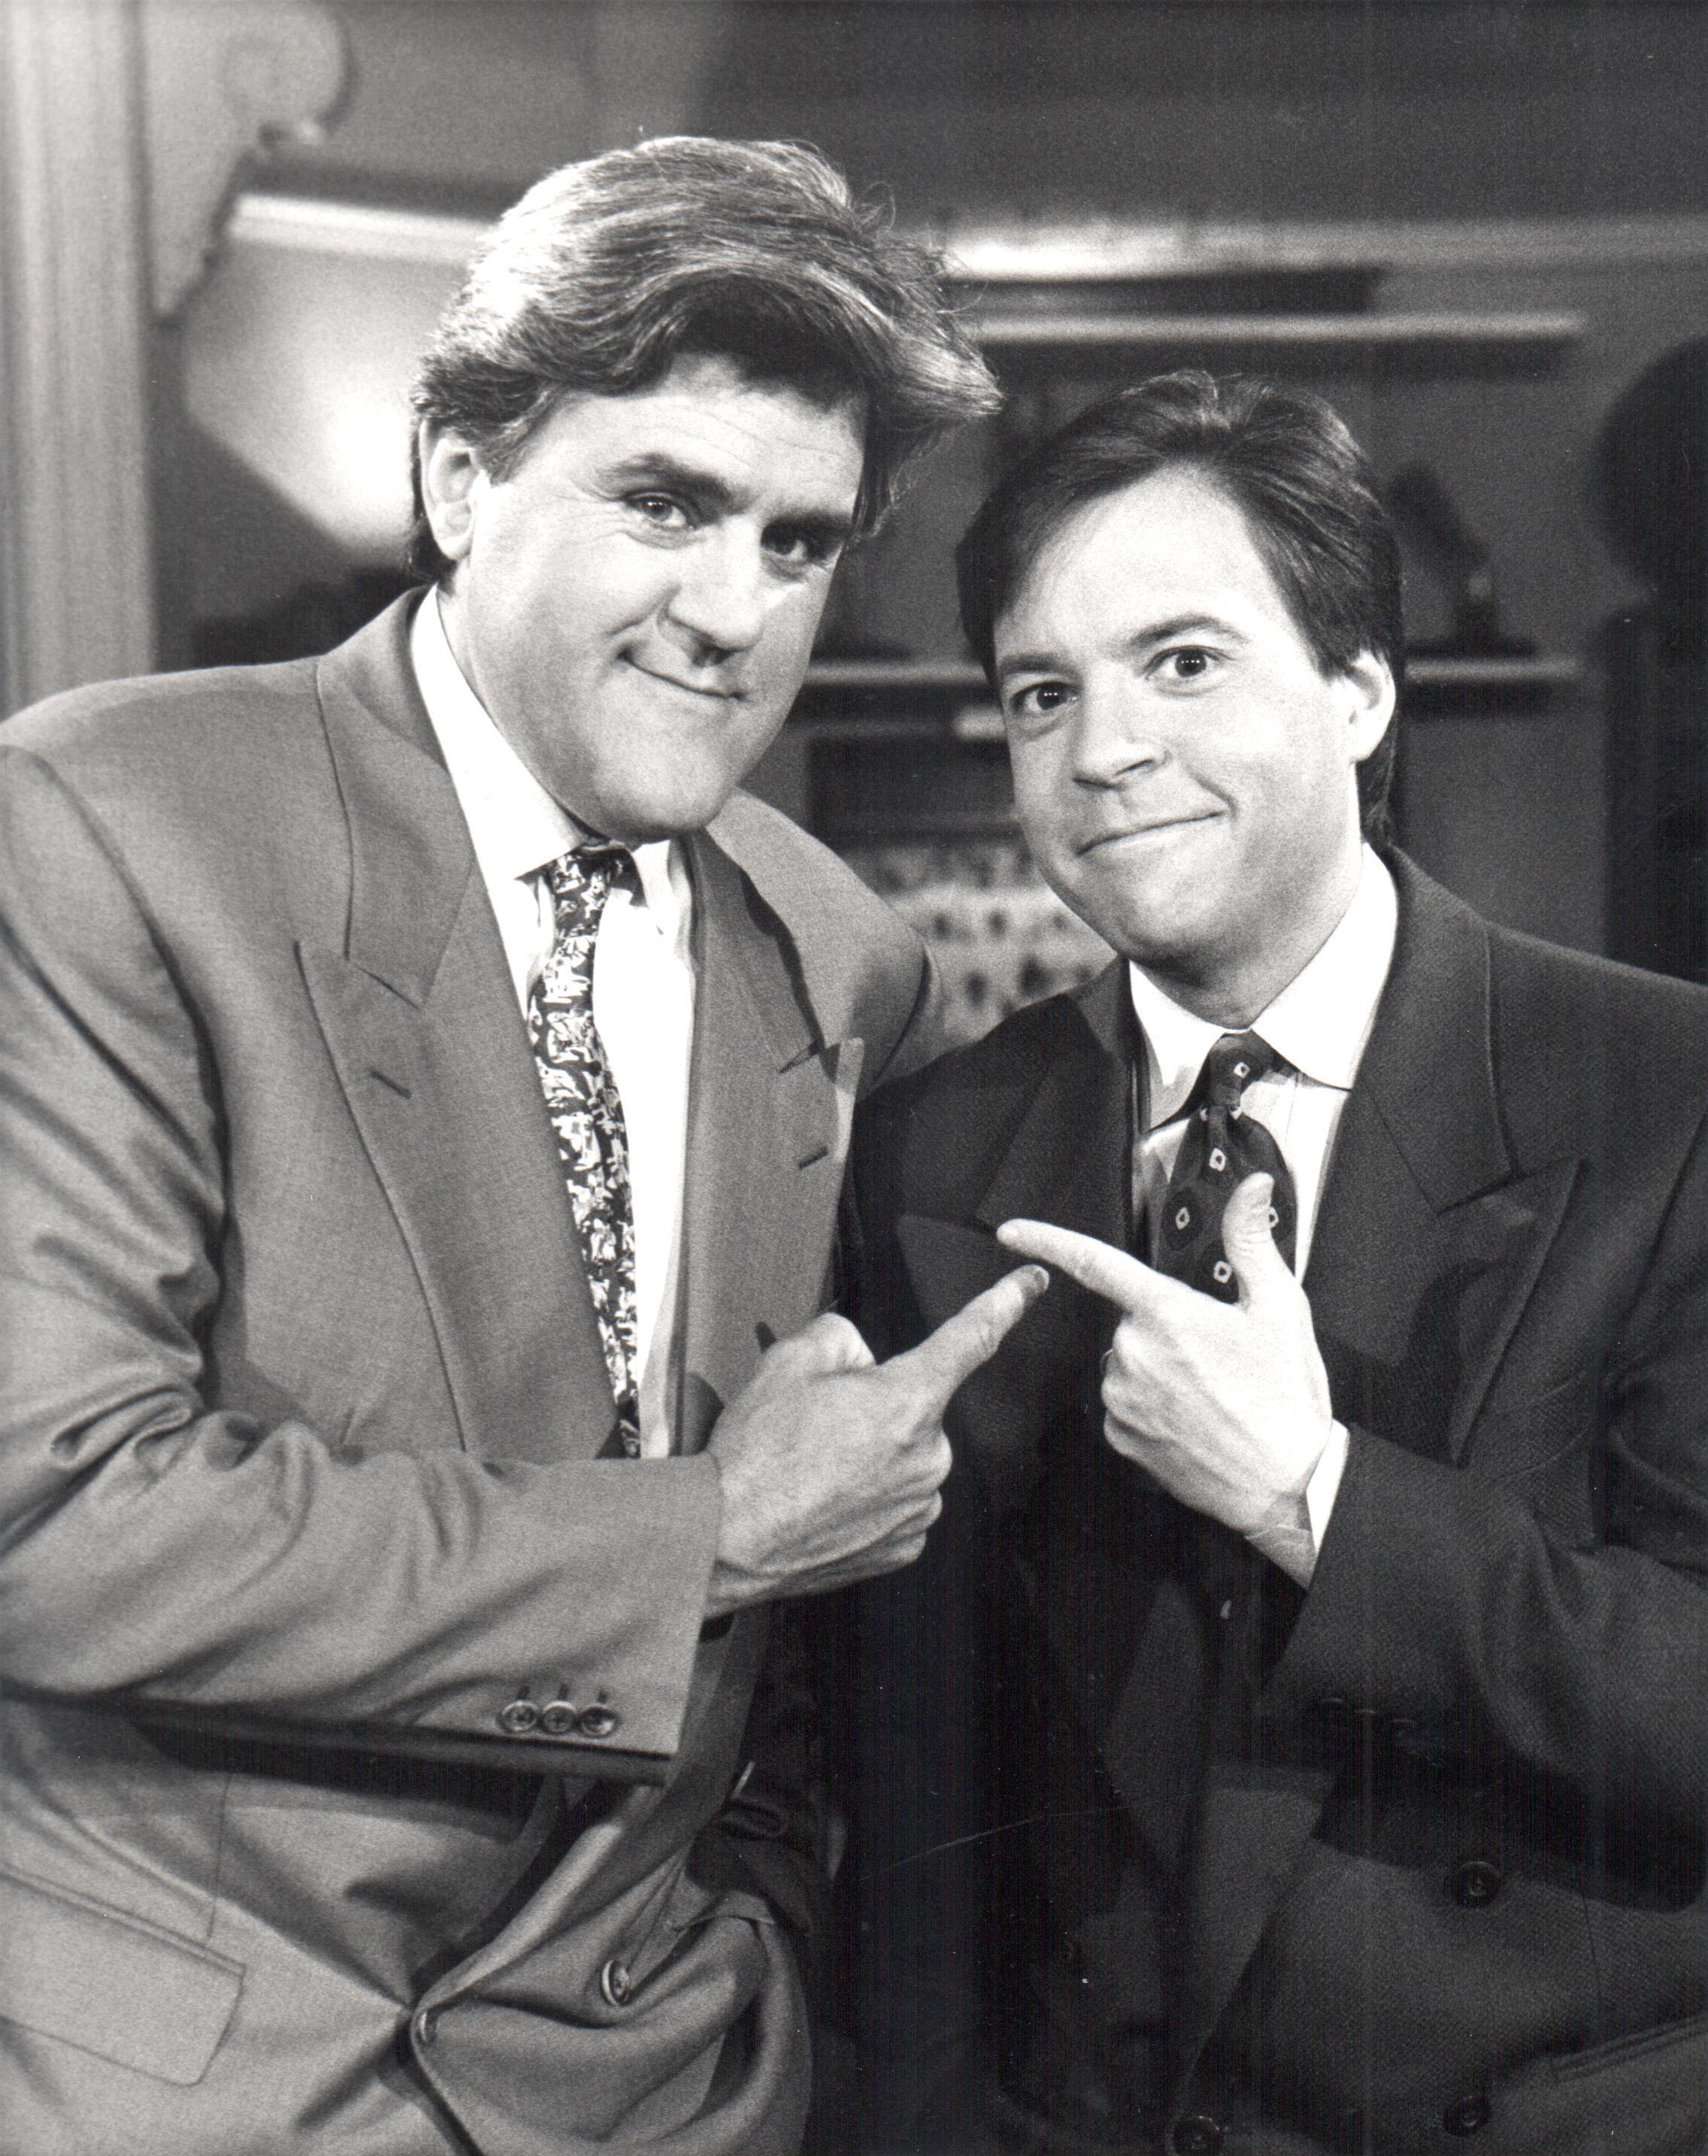 Bob Costas & Jay Leno At Later